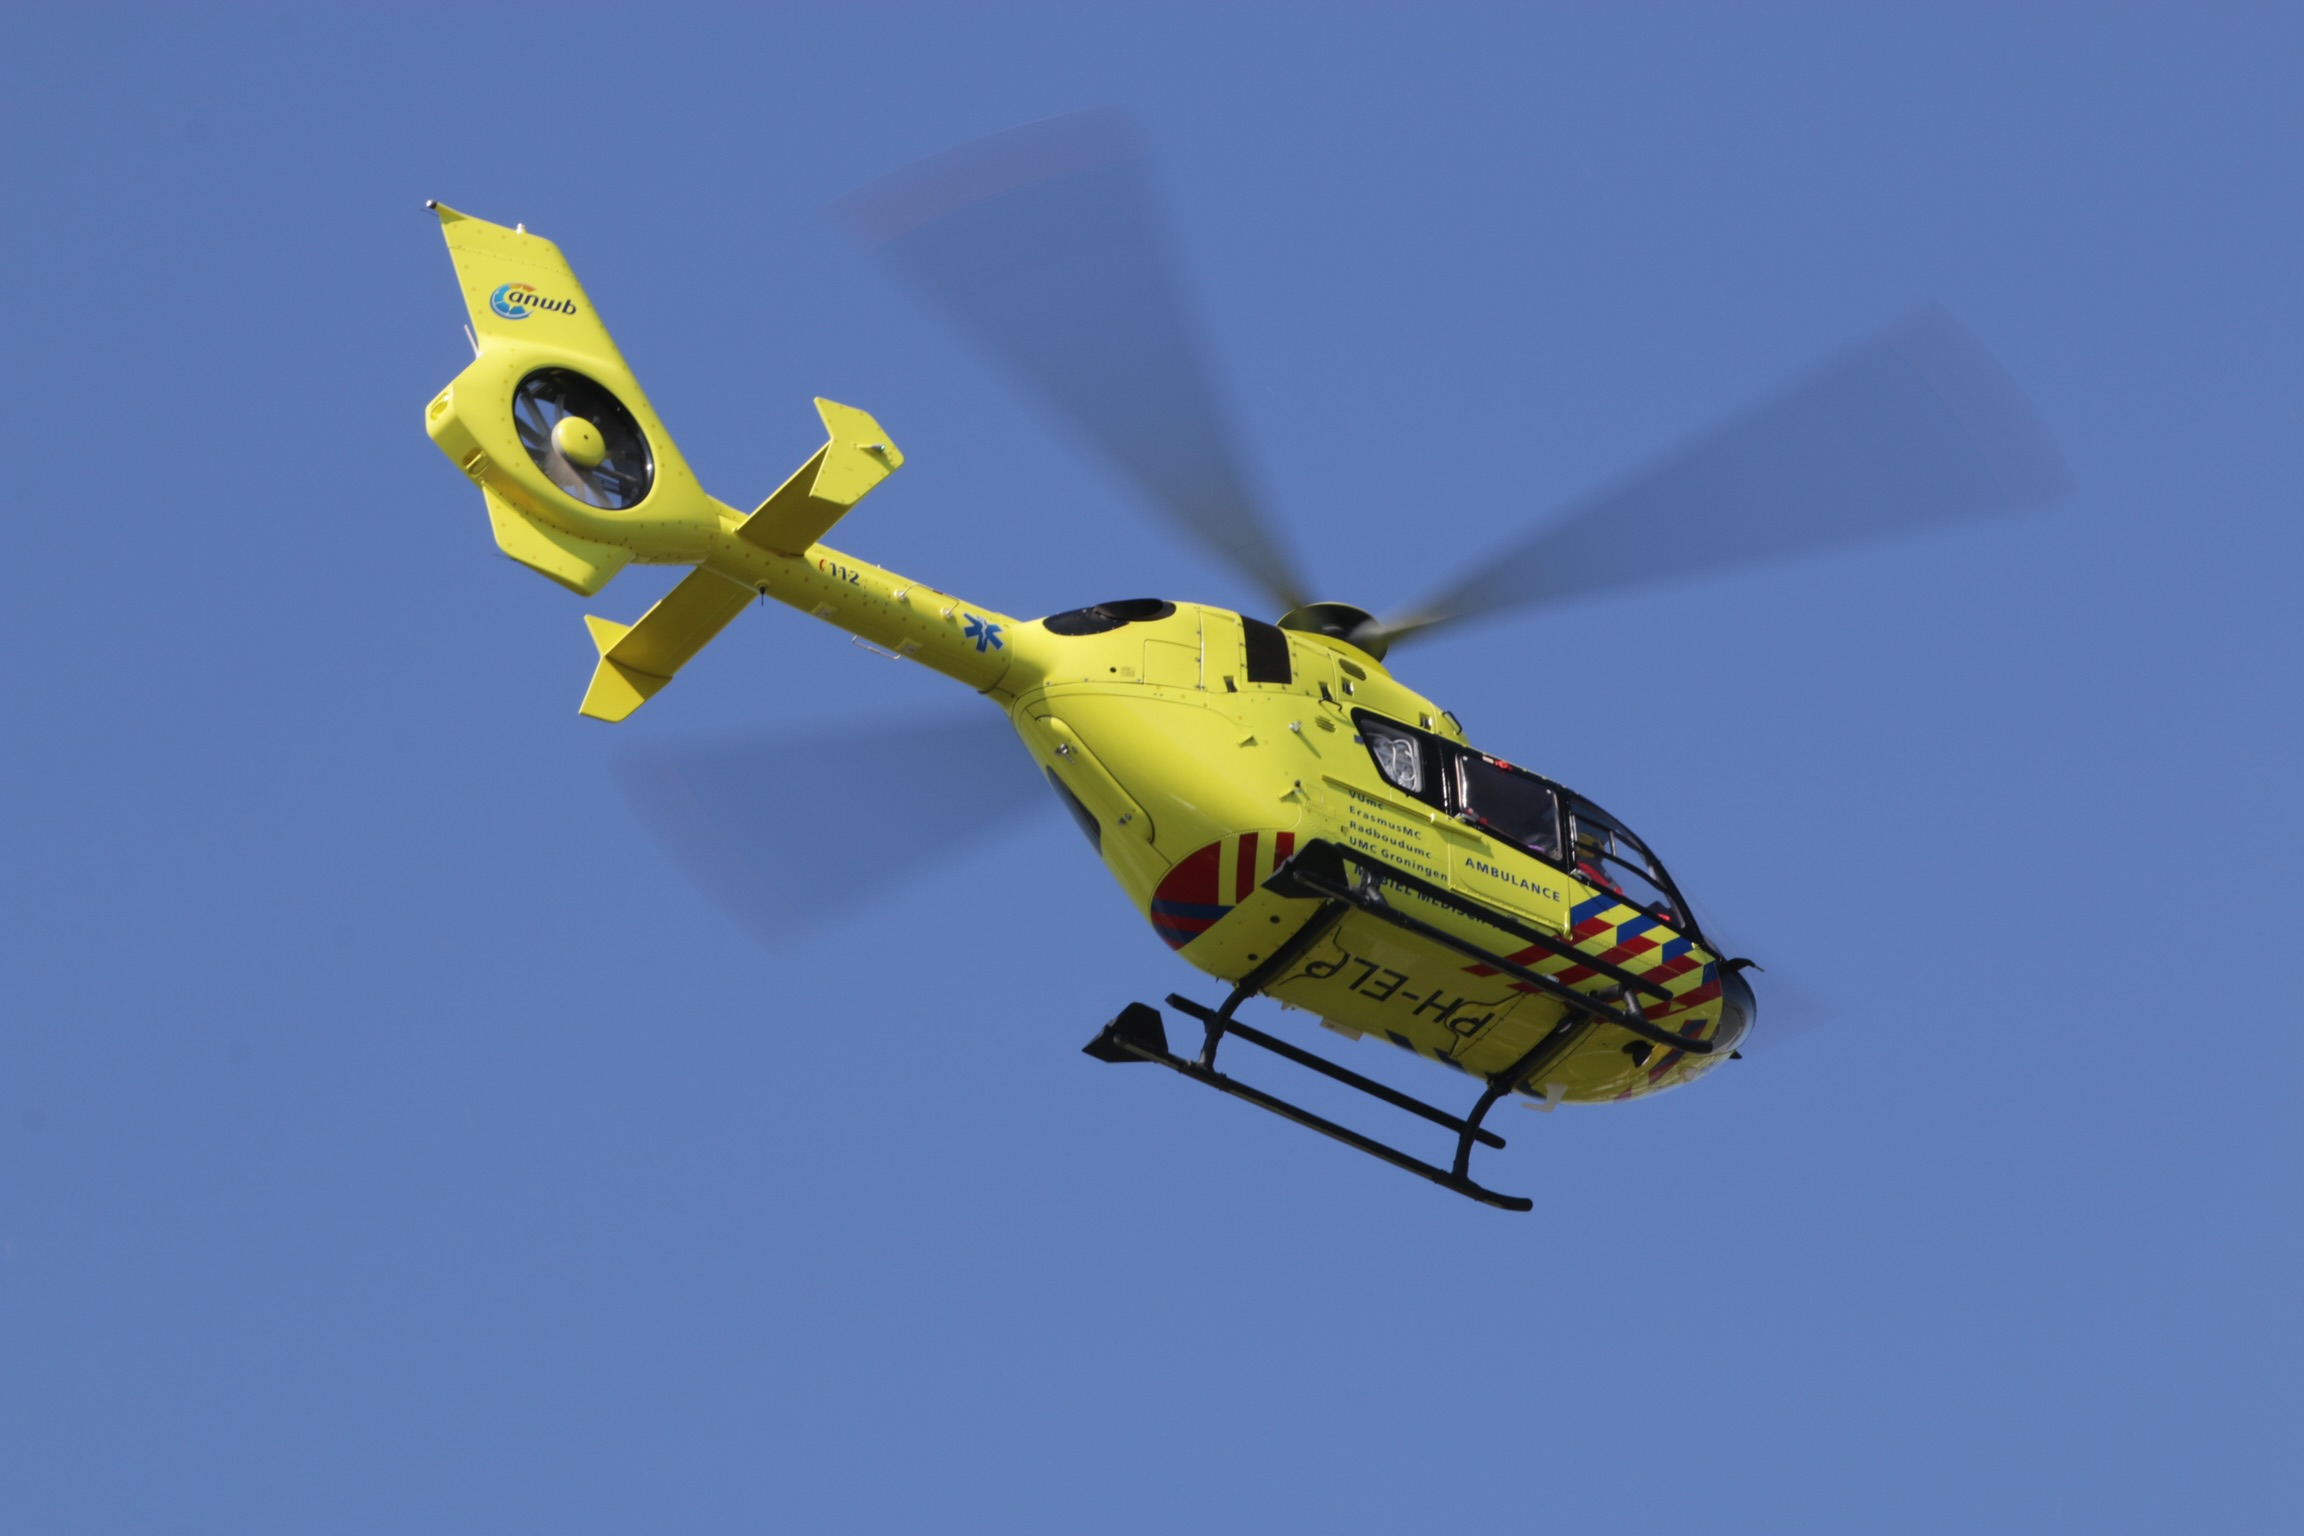 Inzet Traumahelikopter in de Lier